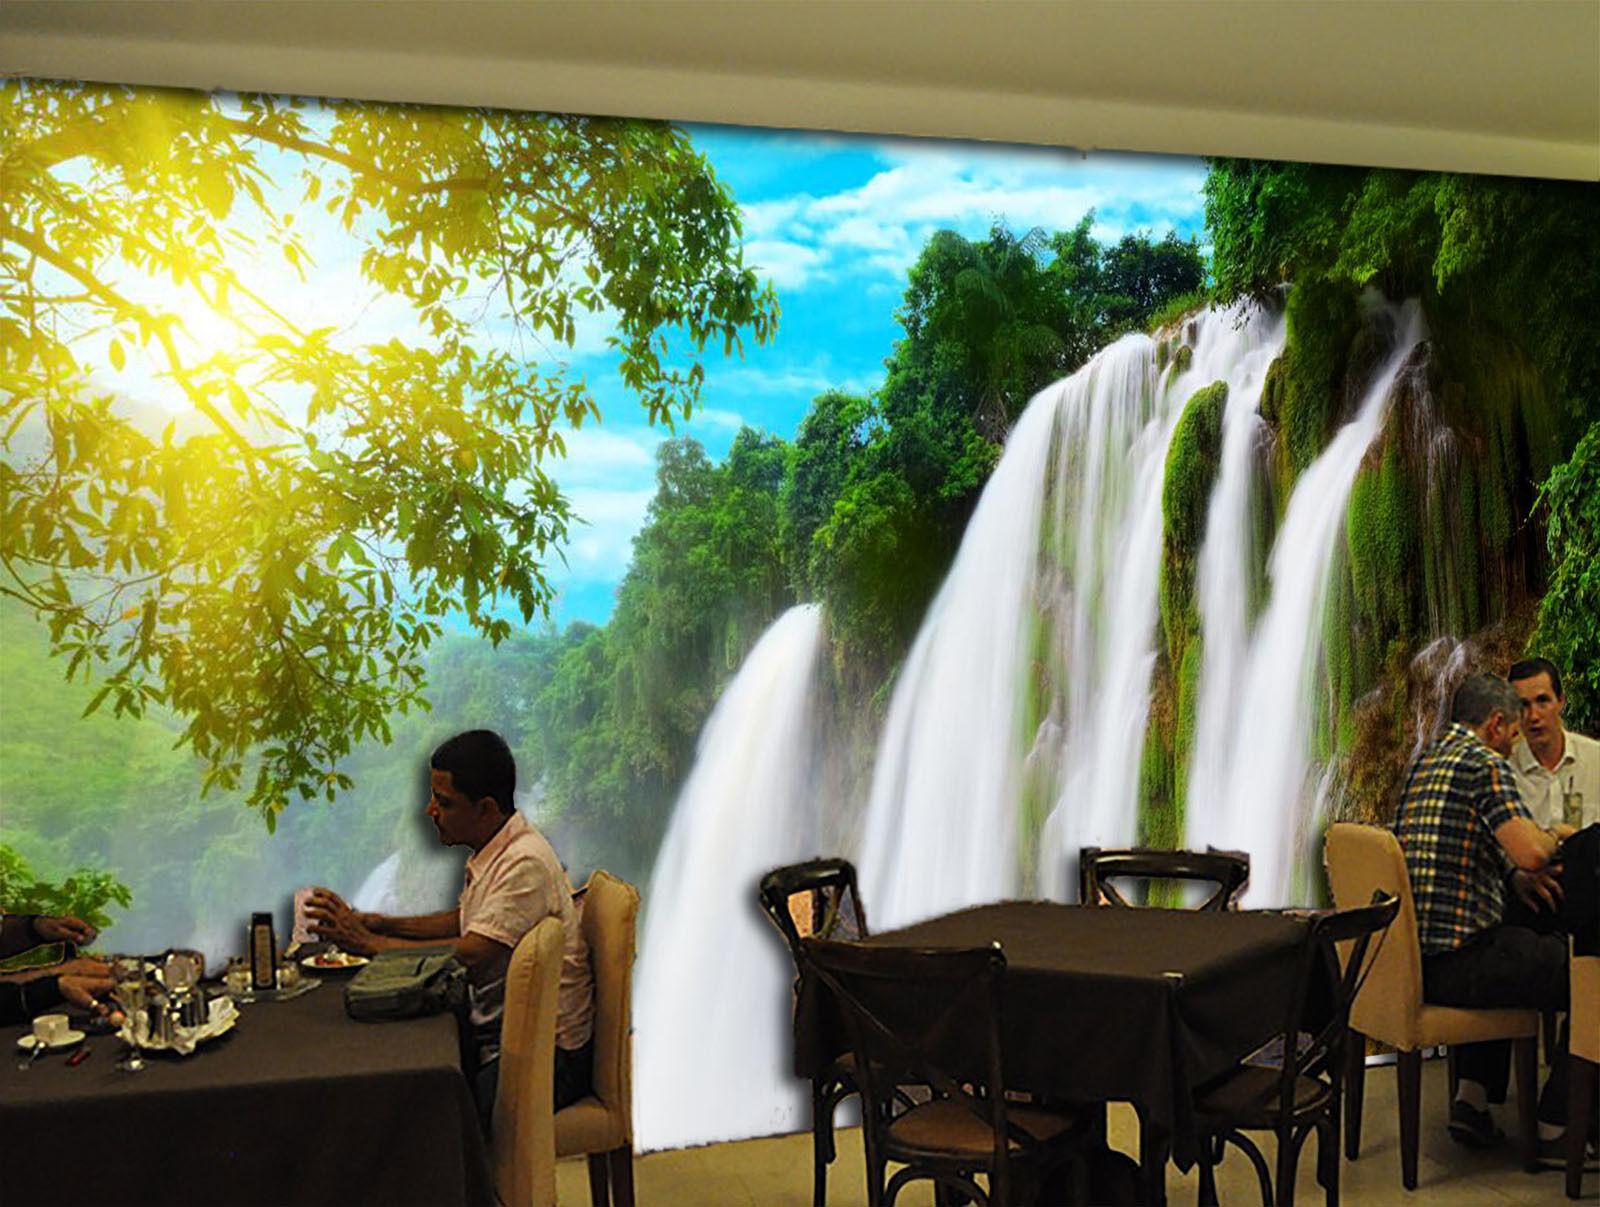 3D Sonnenlicht, Wasserfall 8 Fototapeten Wandbild Fototapete BildTapete Familie